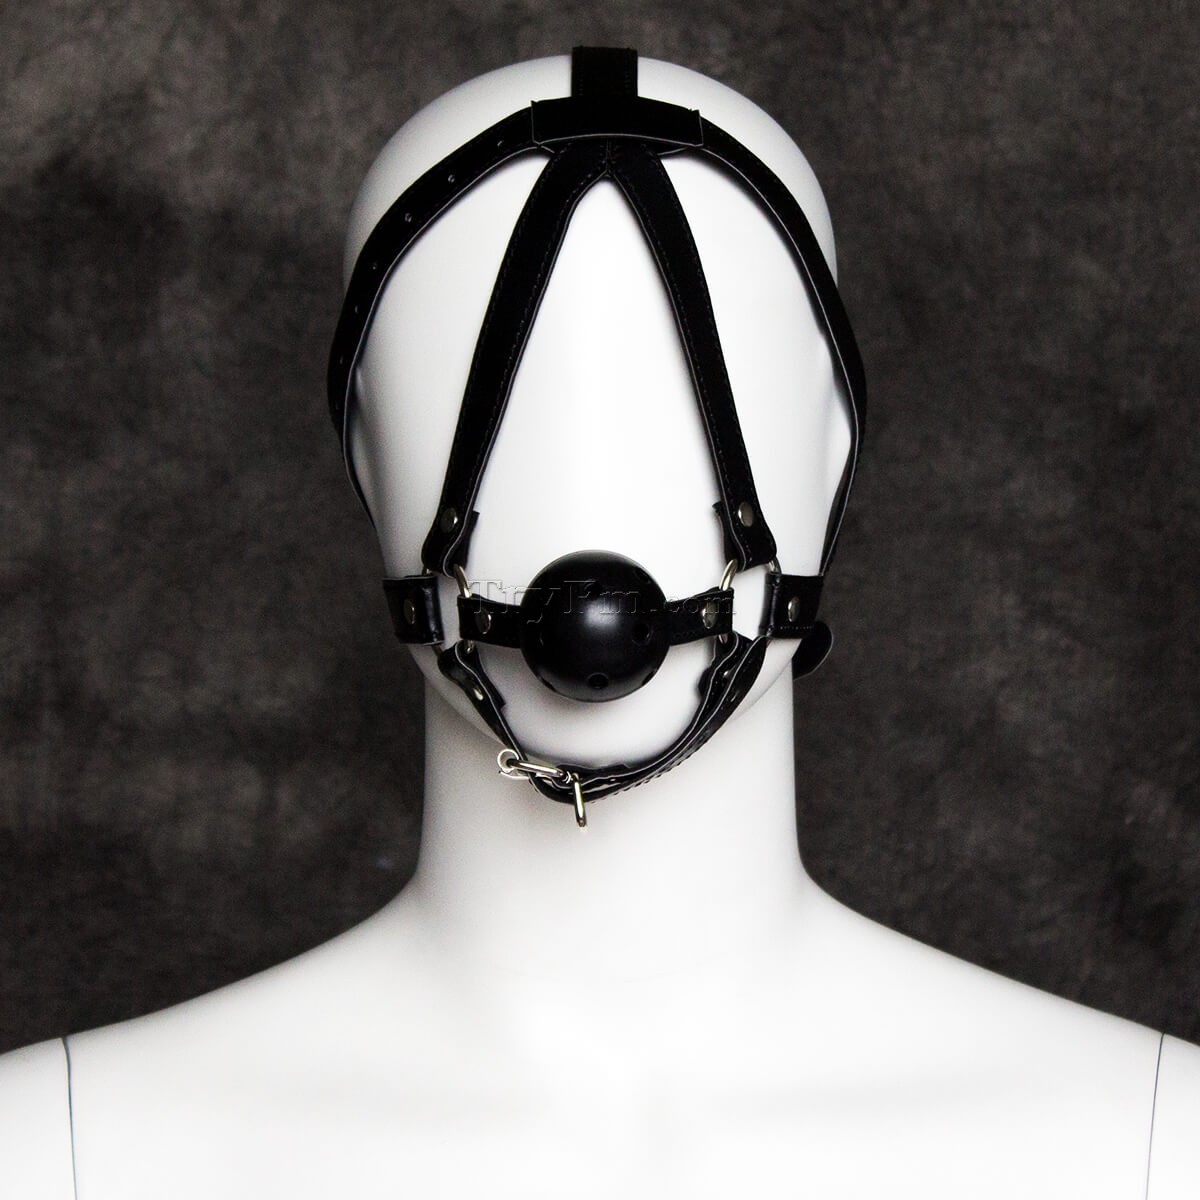 23-Breathable-Ball-Gag-Harness-6.jpg